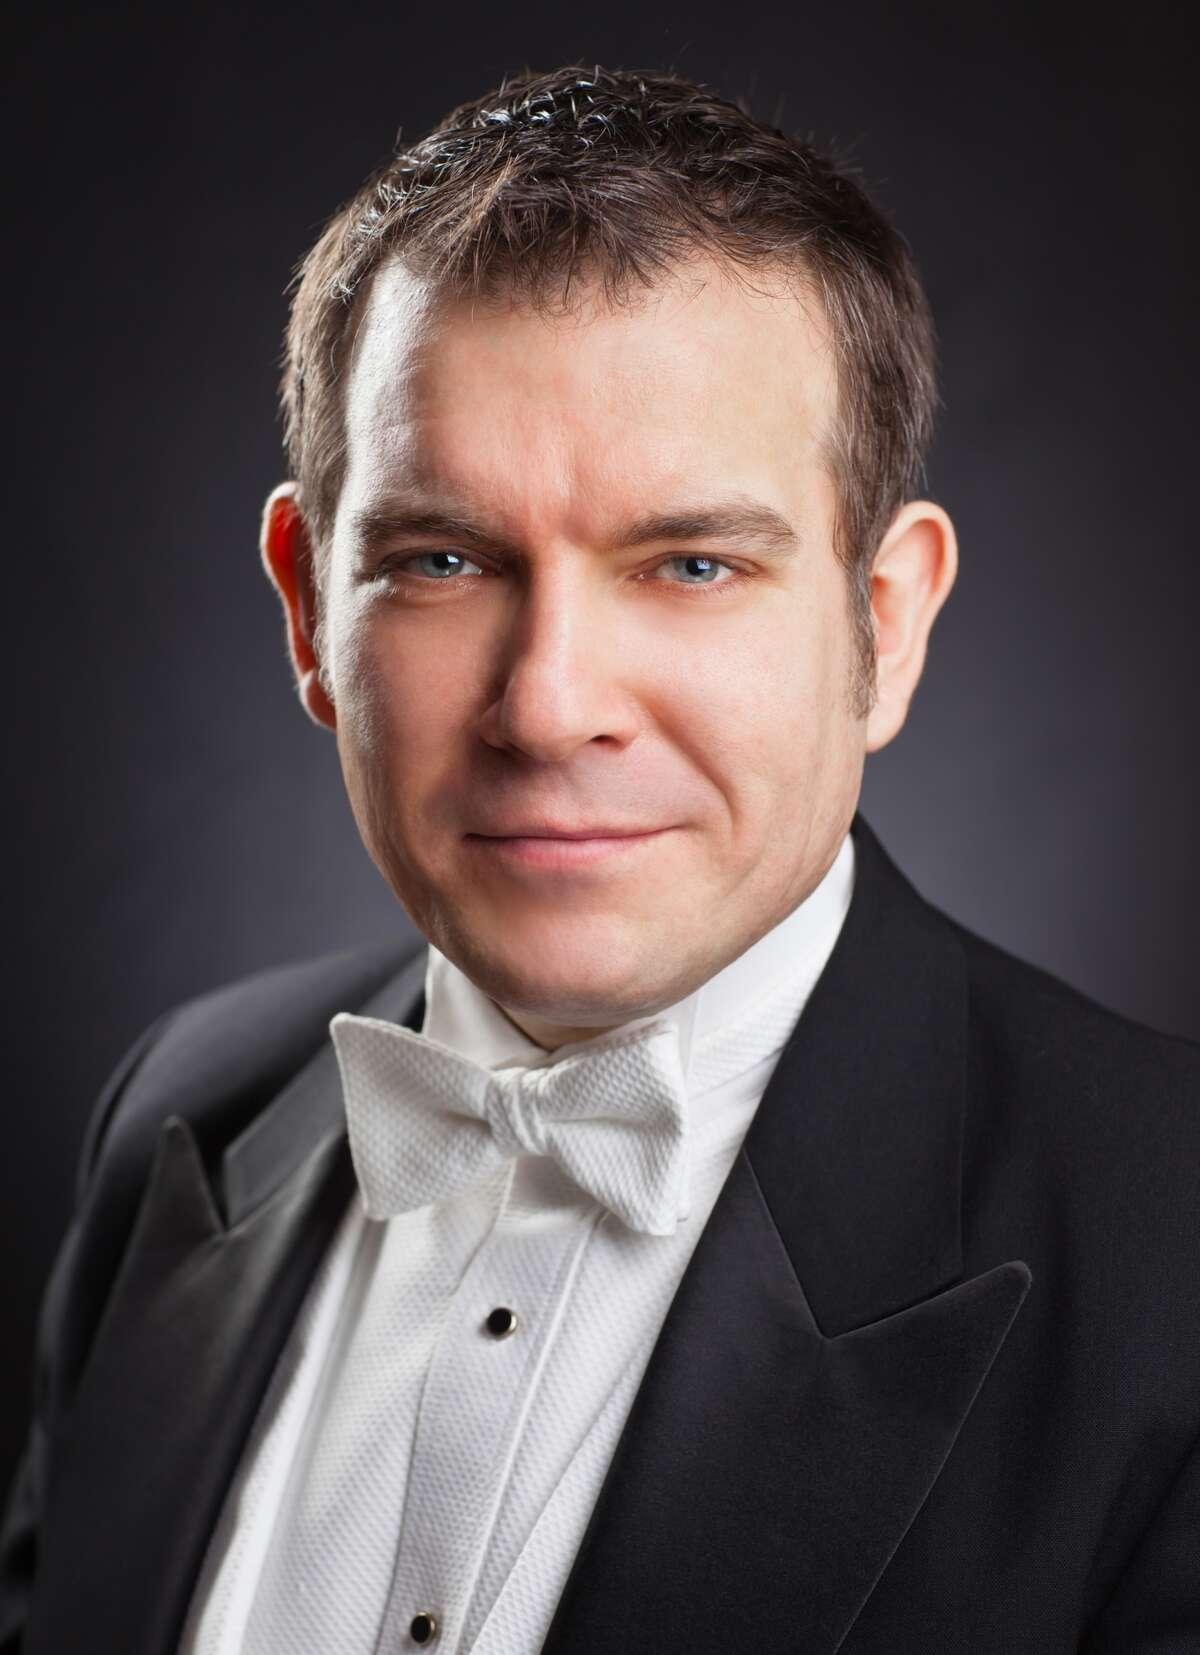 Paolo Bordignon, New York Philharmonic Orchestra harpsichordist and St. Paul's United Methodist Church organist/choirmaster. Photo by Chris Lee